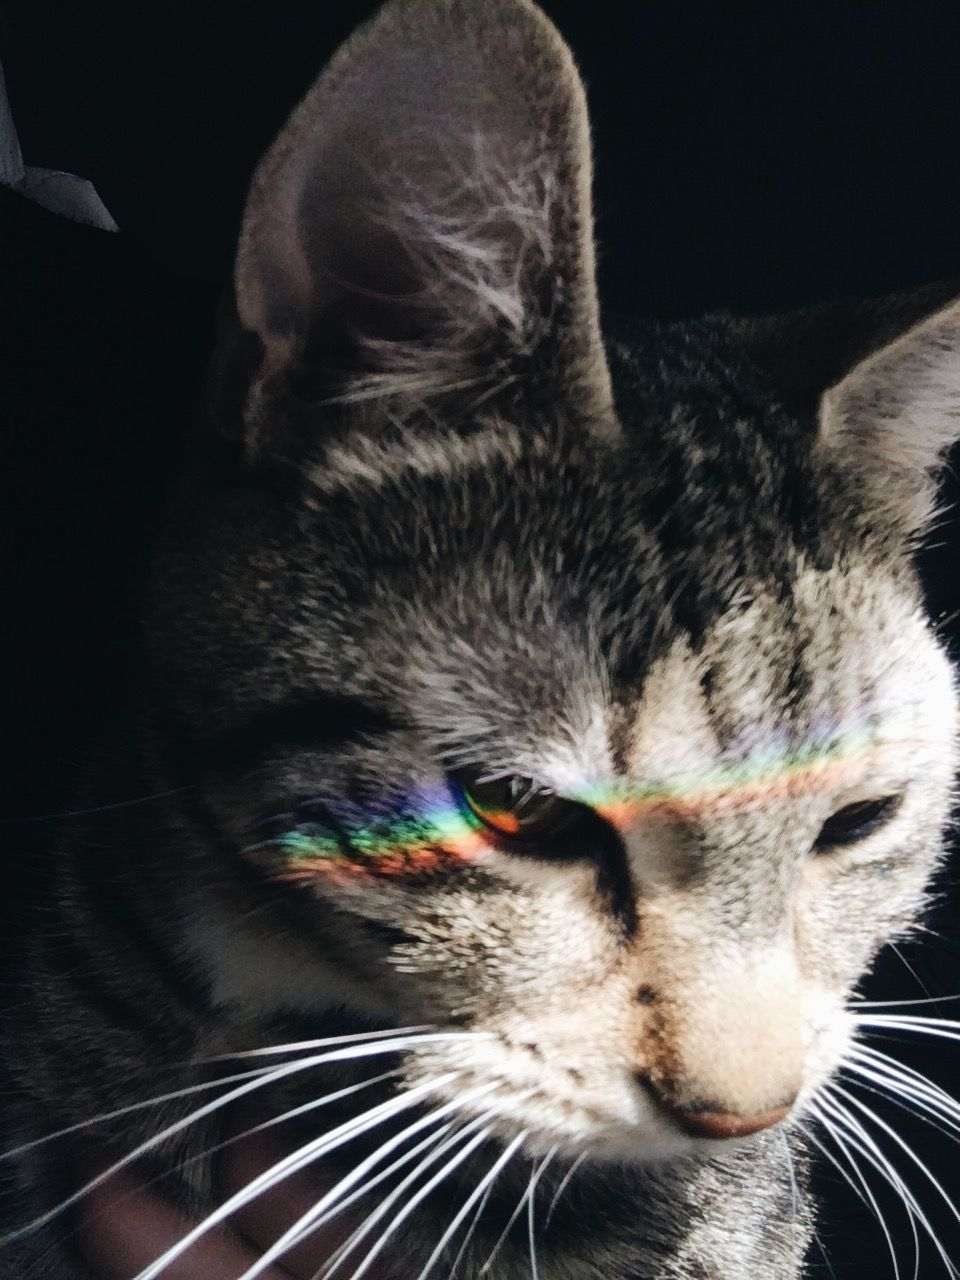 65caba08f cats, cute, tumblr, aesthetic #CatTumblr Cat Aesthetic, Rainbow Aesthetic,  Aesthetic